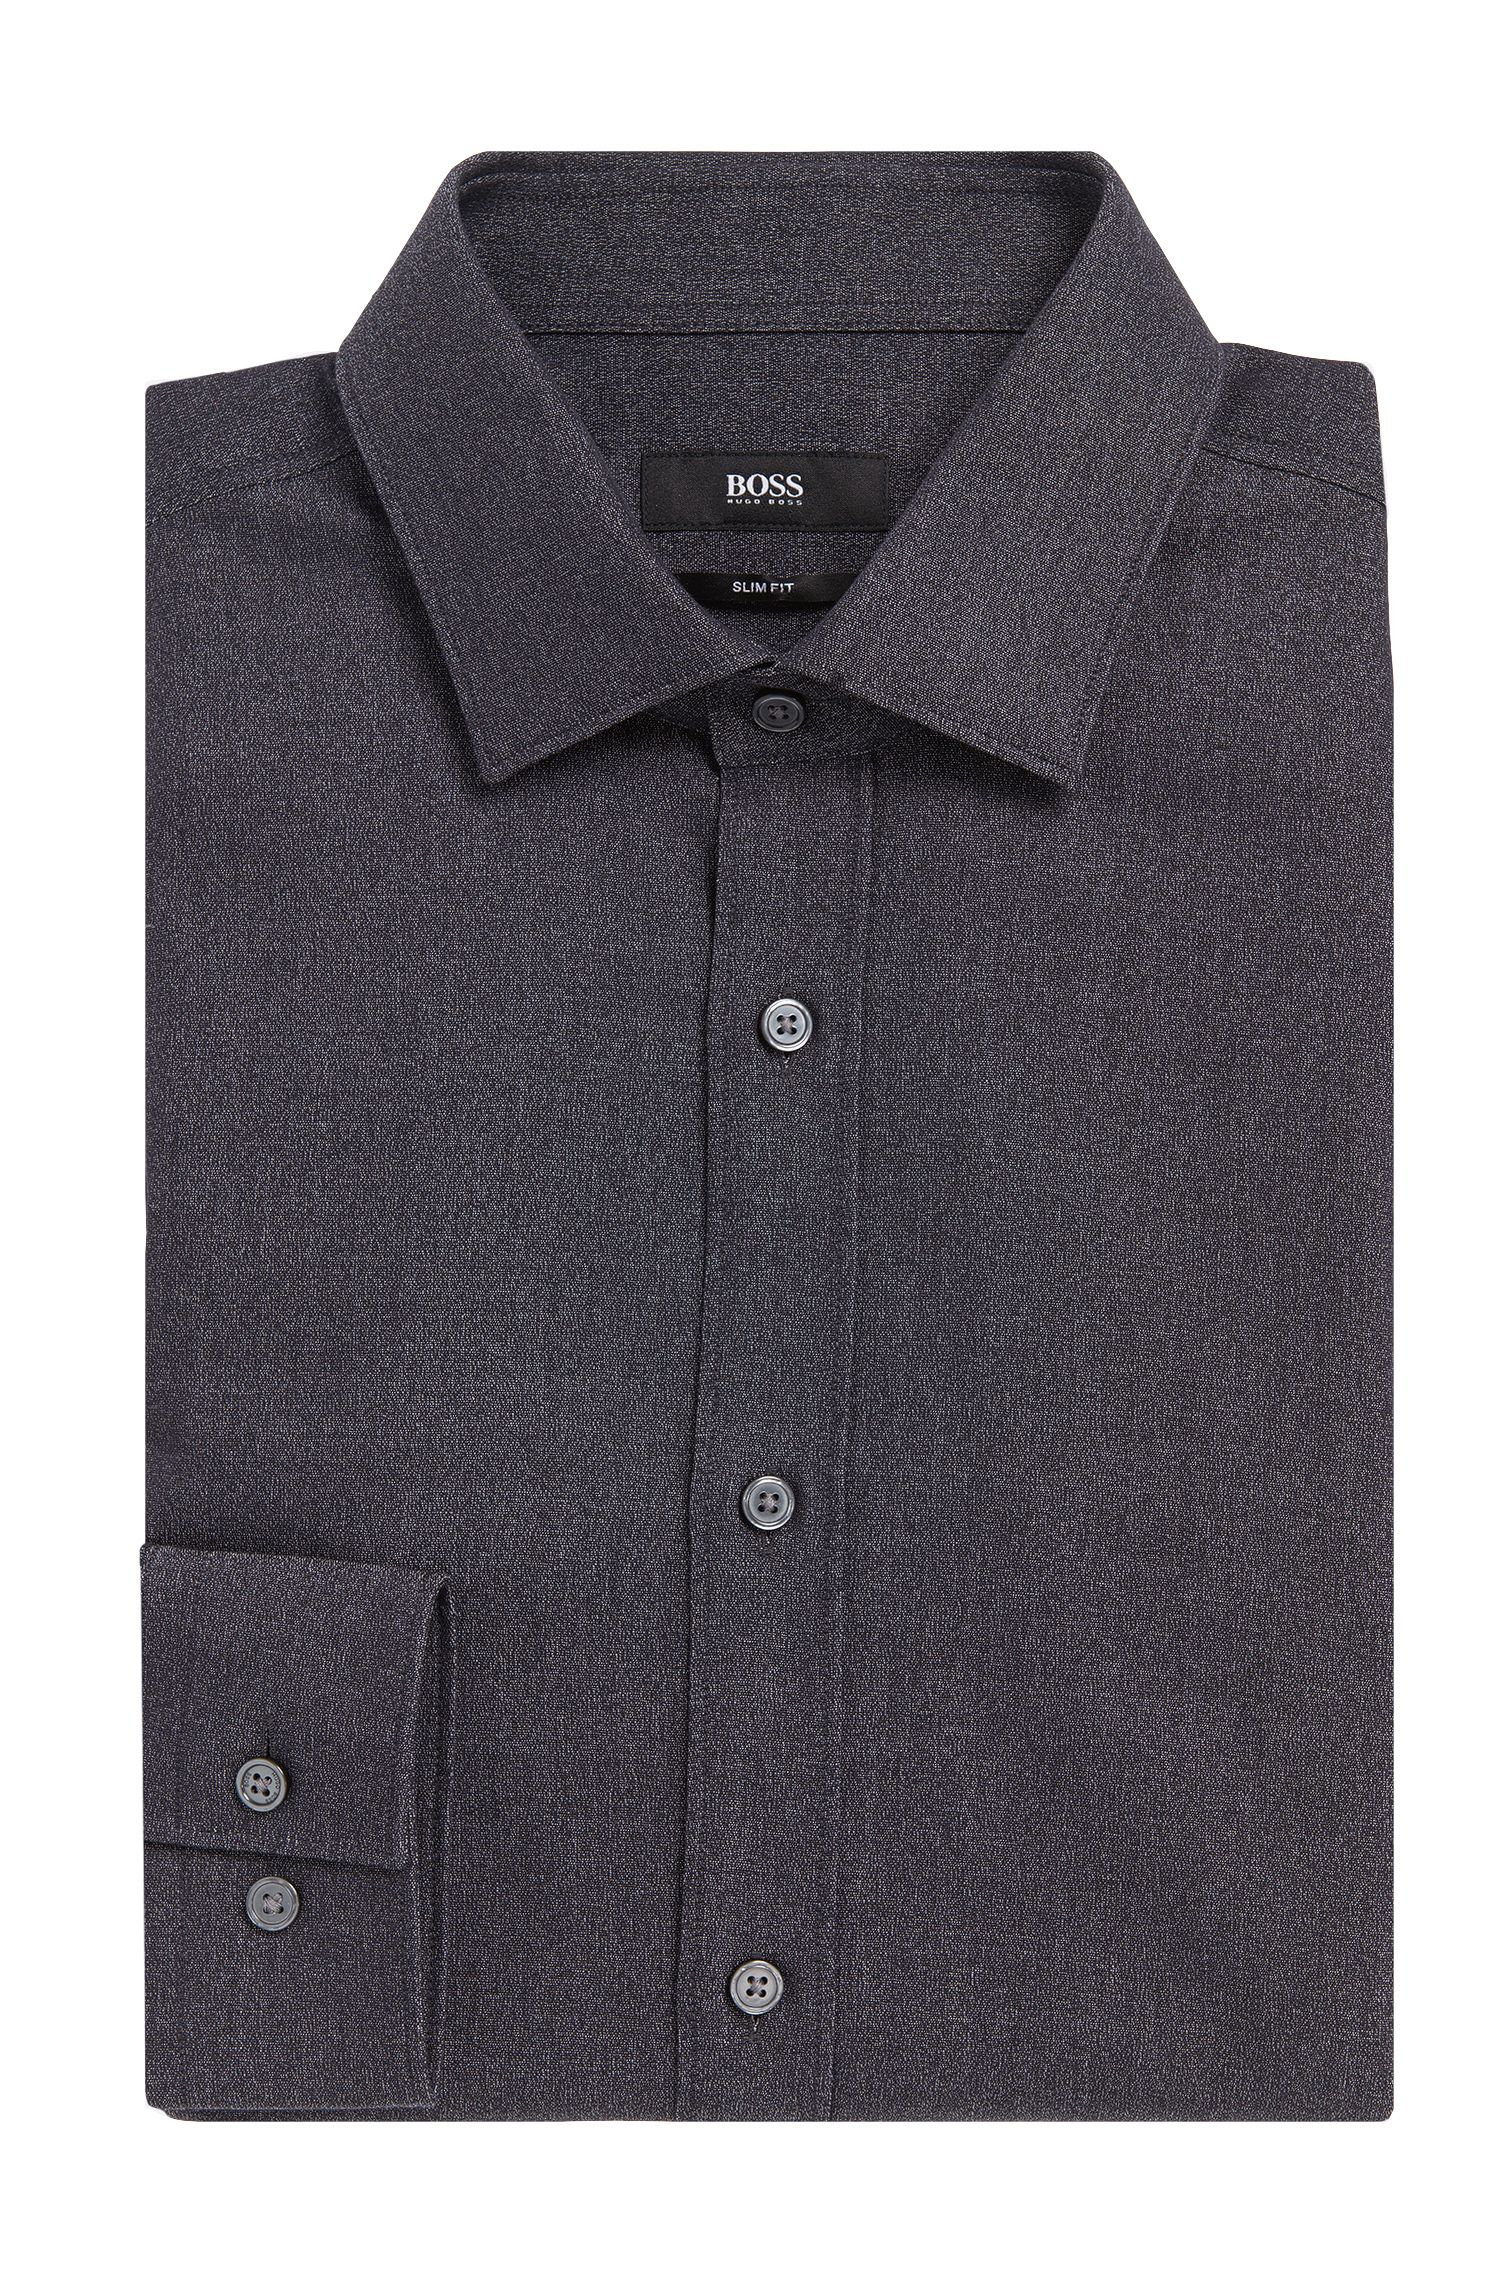 'Isaak' | Slim Fit, Cotton Dress Shirt